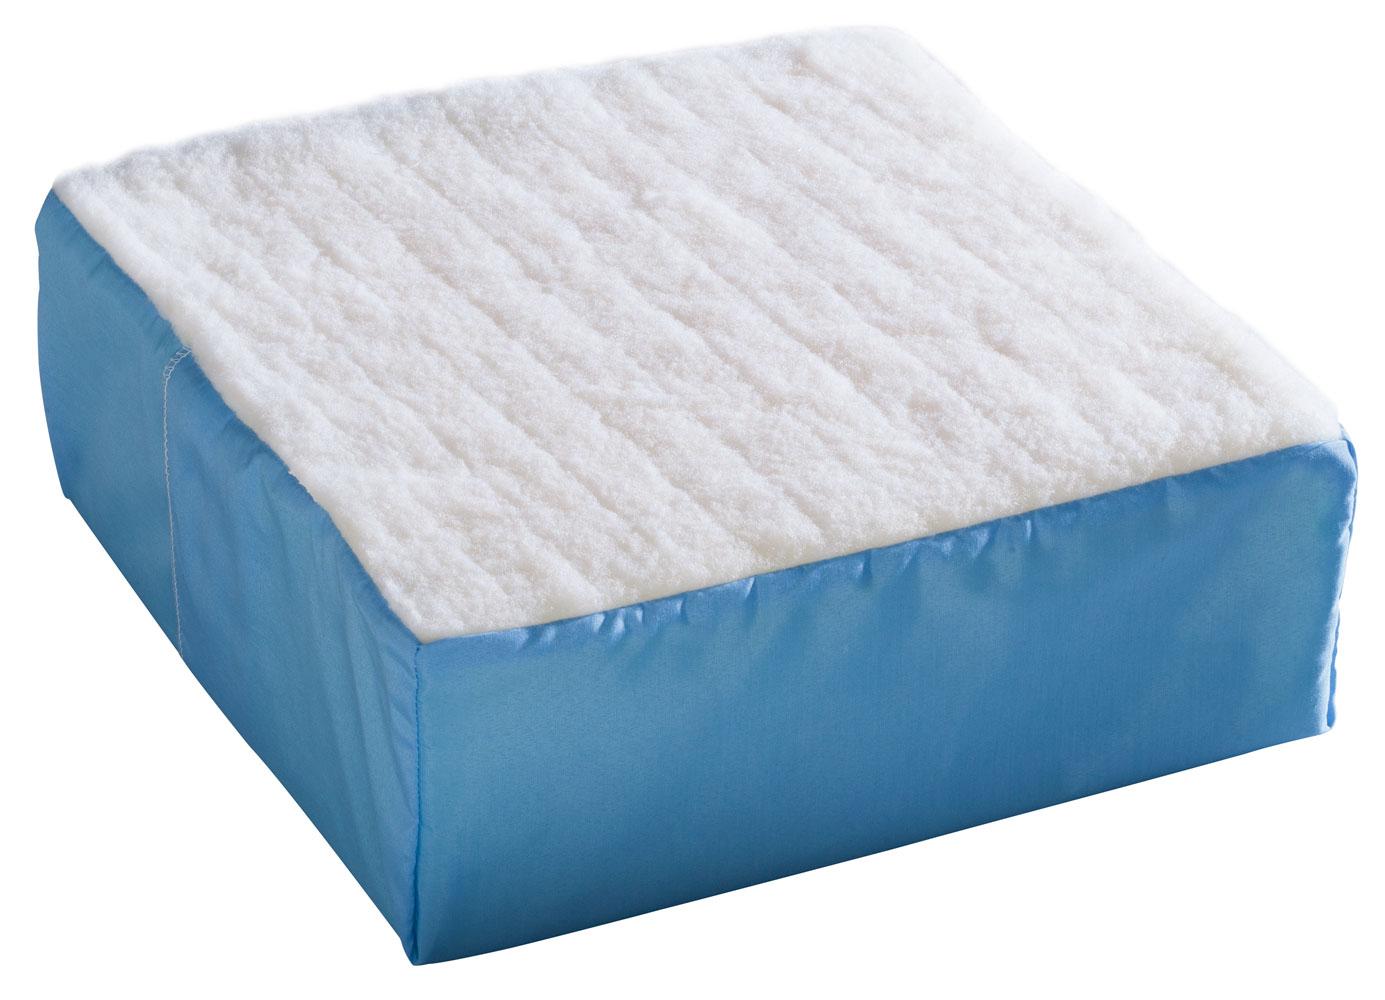 Premium 5 Inch Gel Foam Fleece Seat Cushion Orthopedic